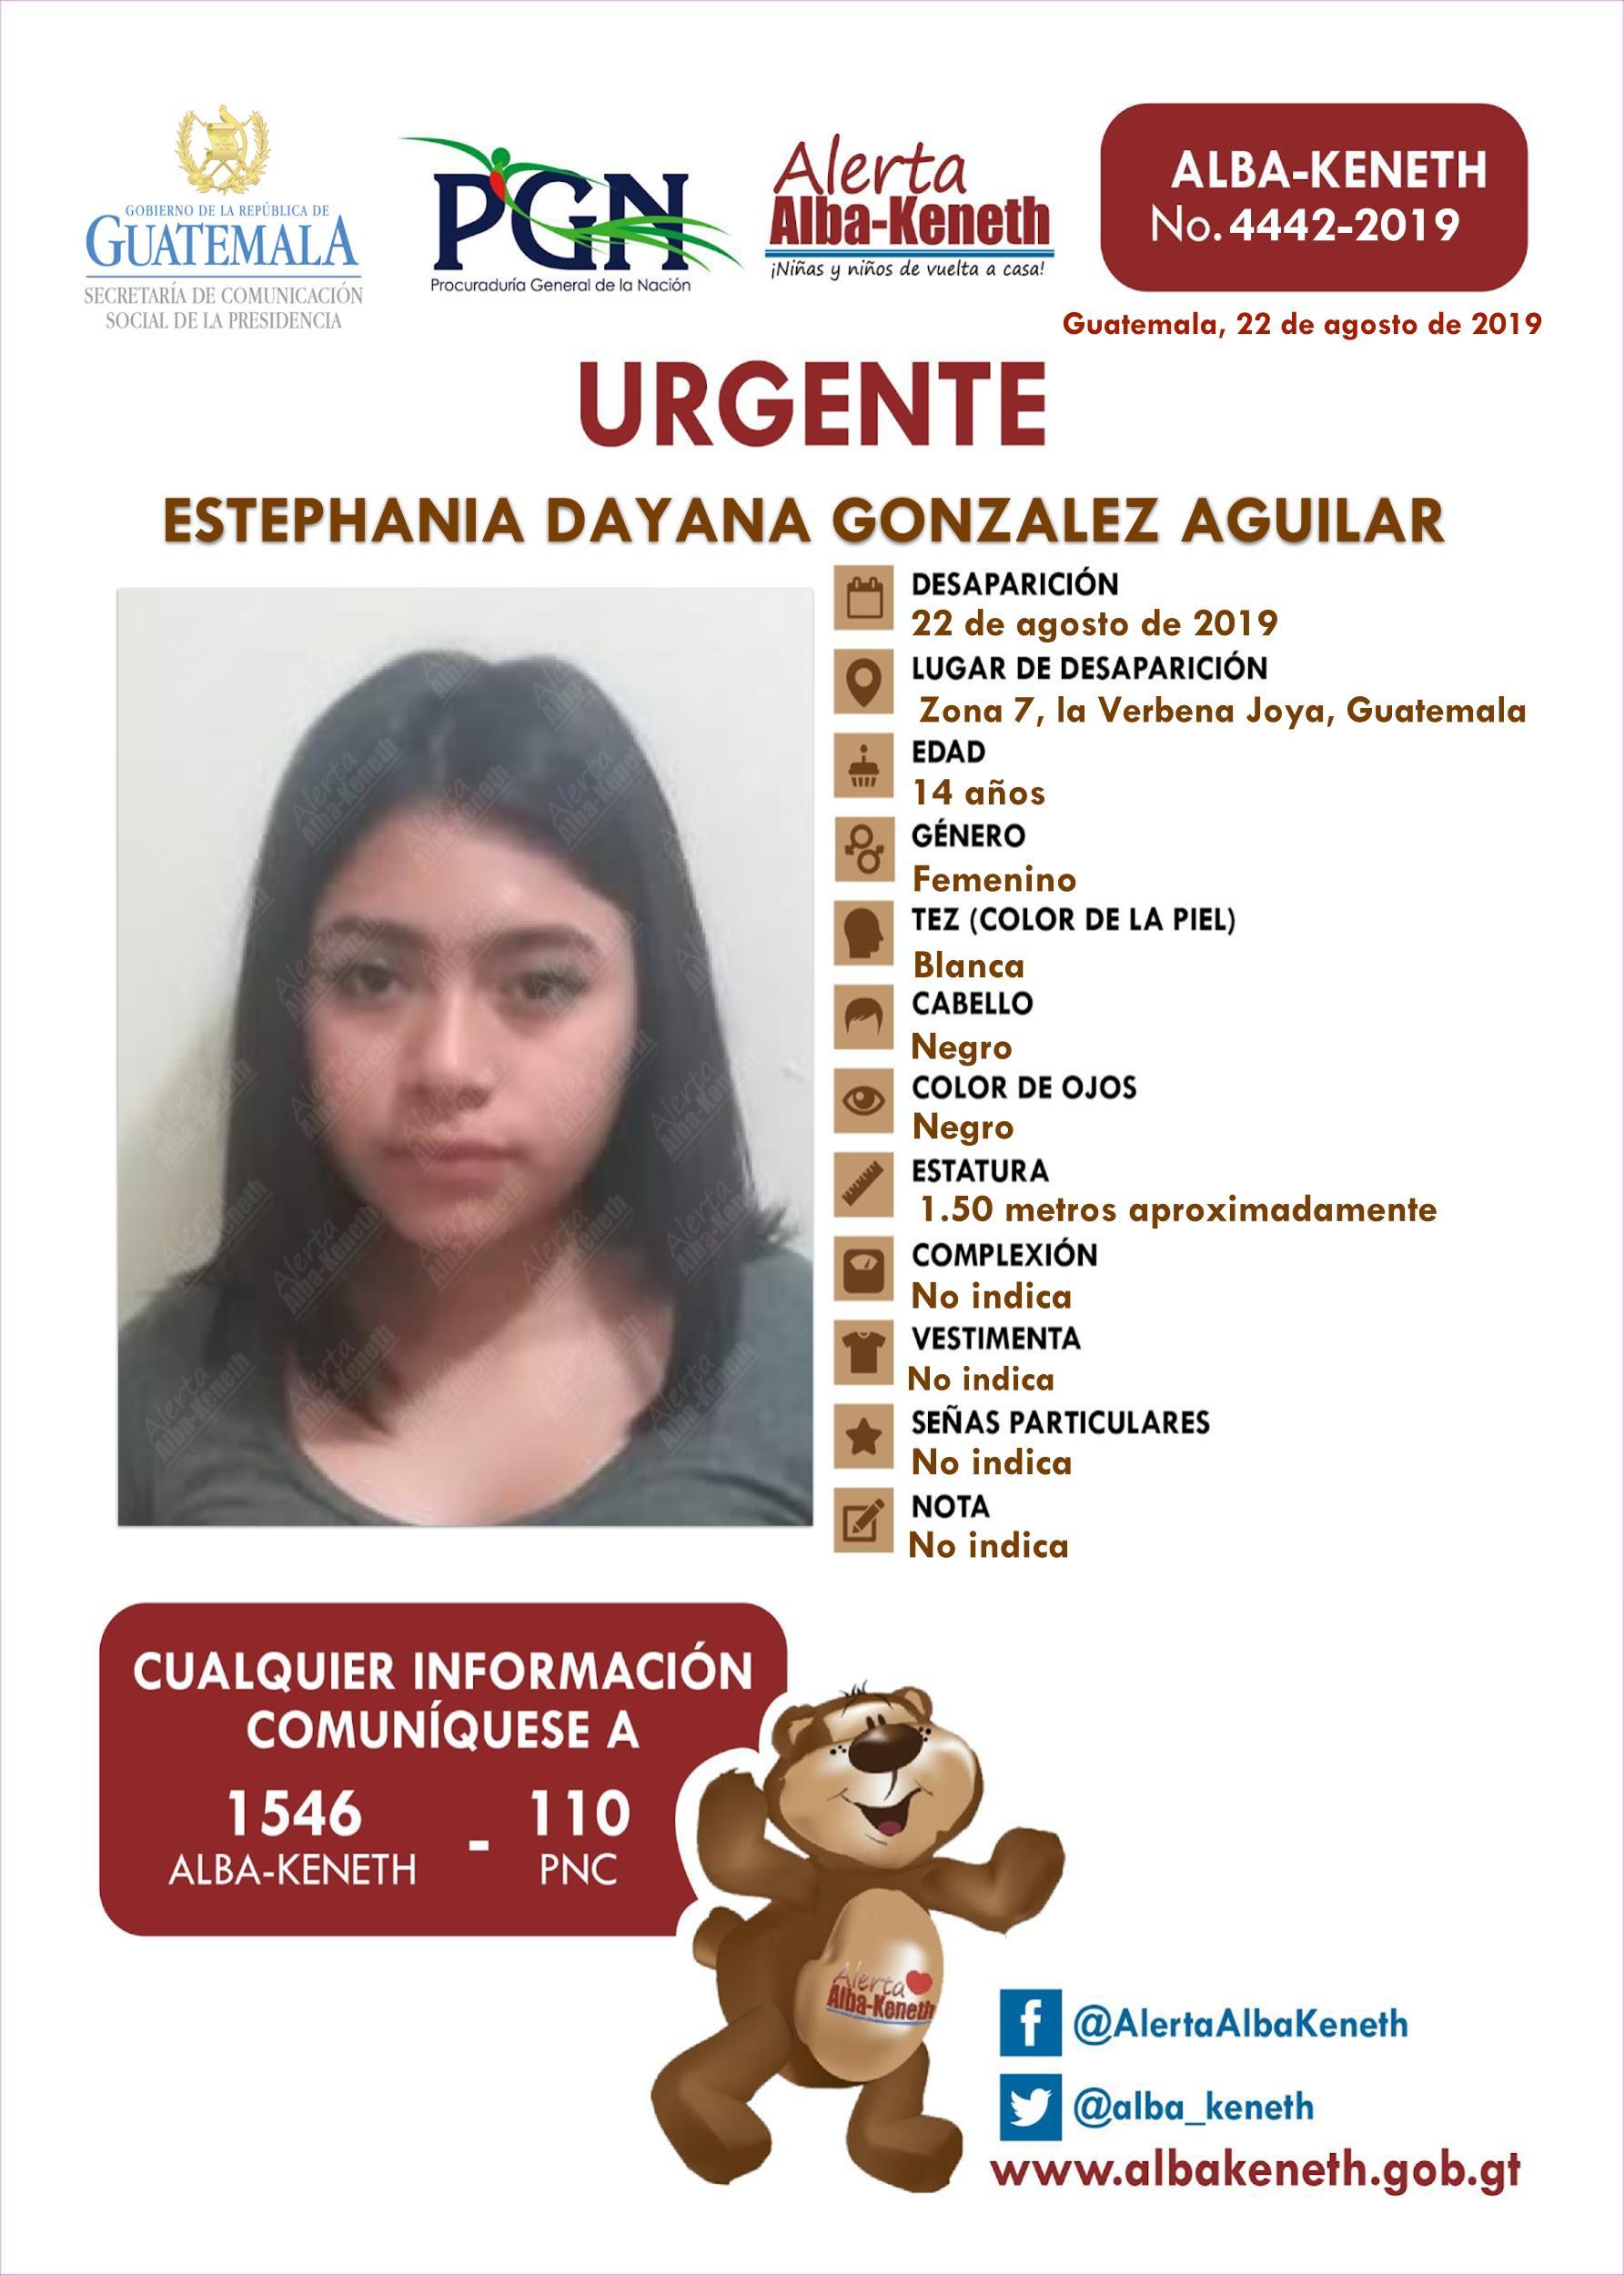 Estephania Dayana Gonzalez Aguilar